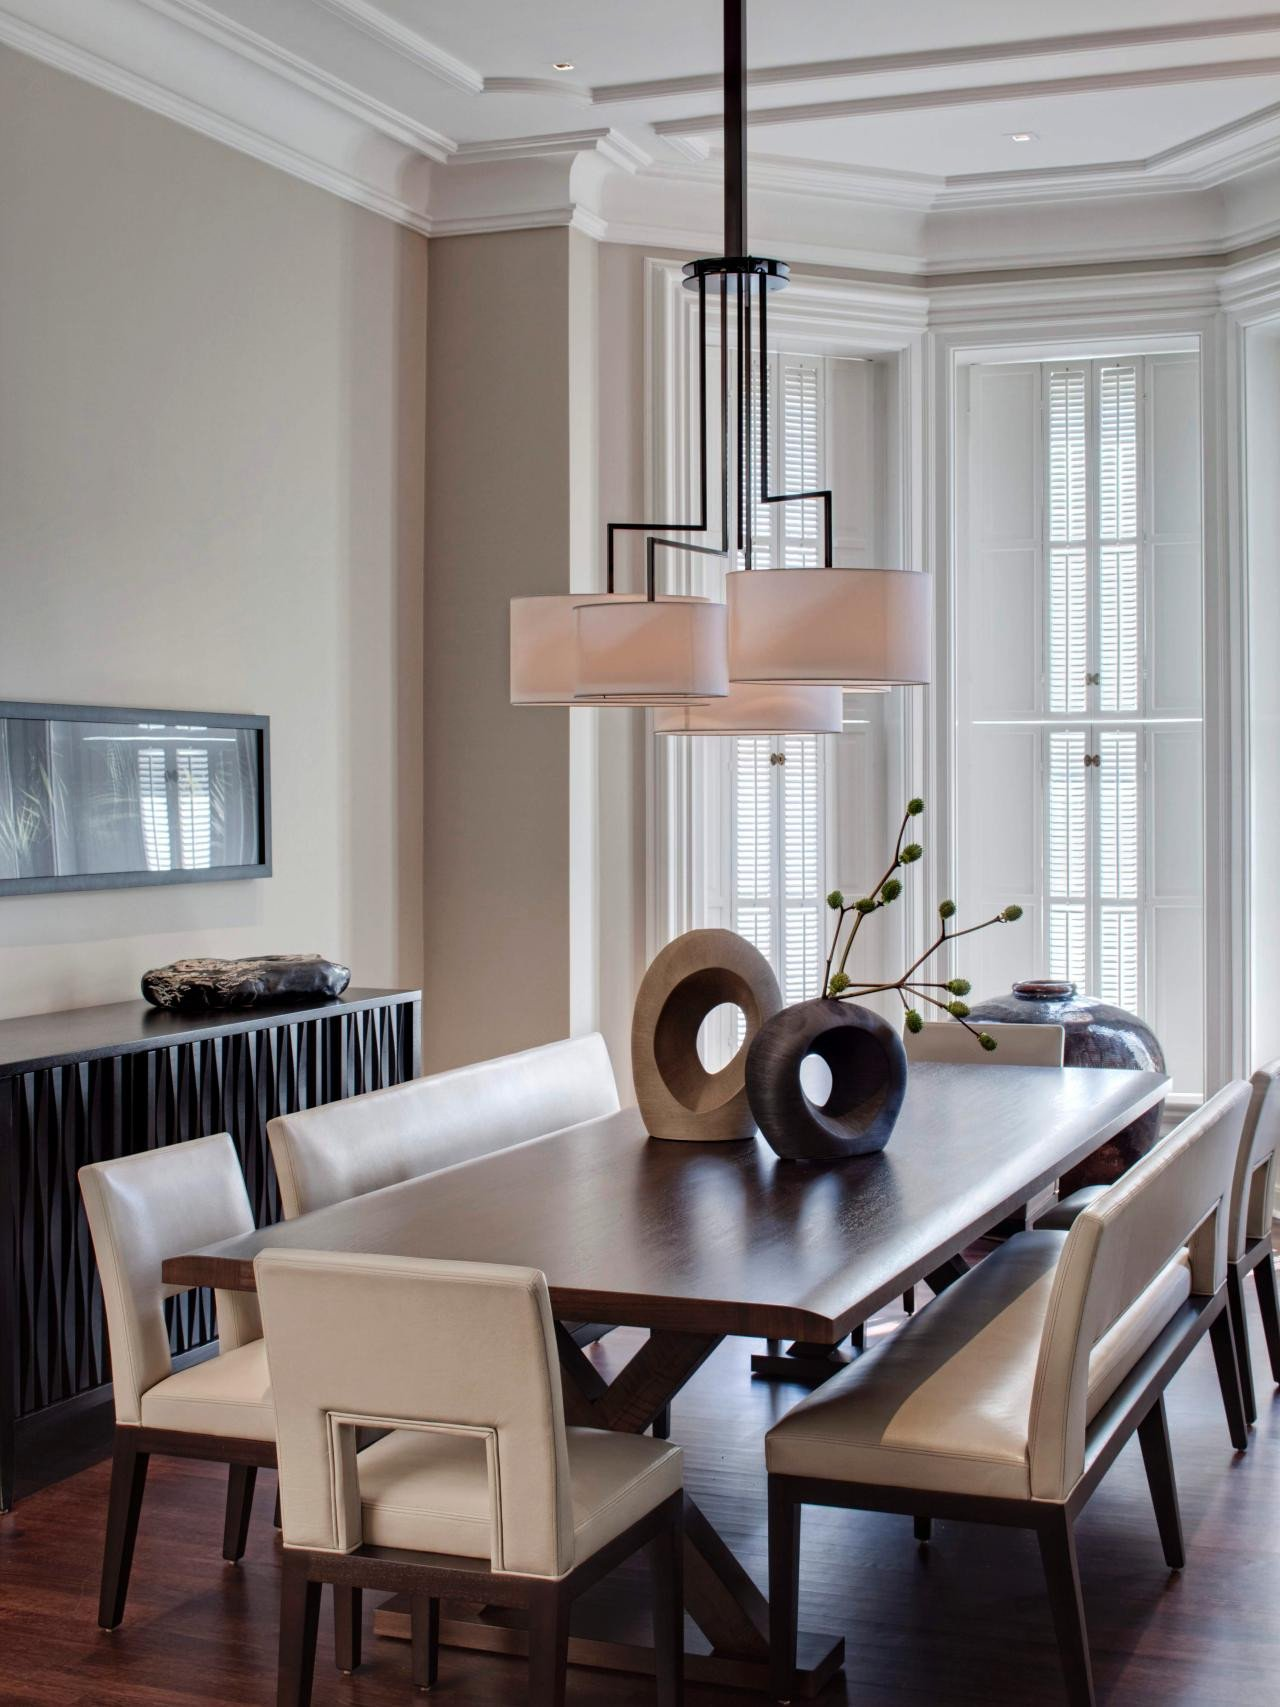 Contemporary Living Room Benches Elegant 6 Dining Room Trends to Try Living Room and Dining Room Decorating Ideas and Design